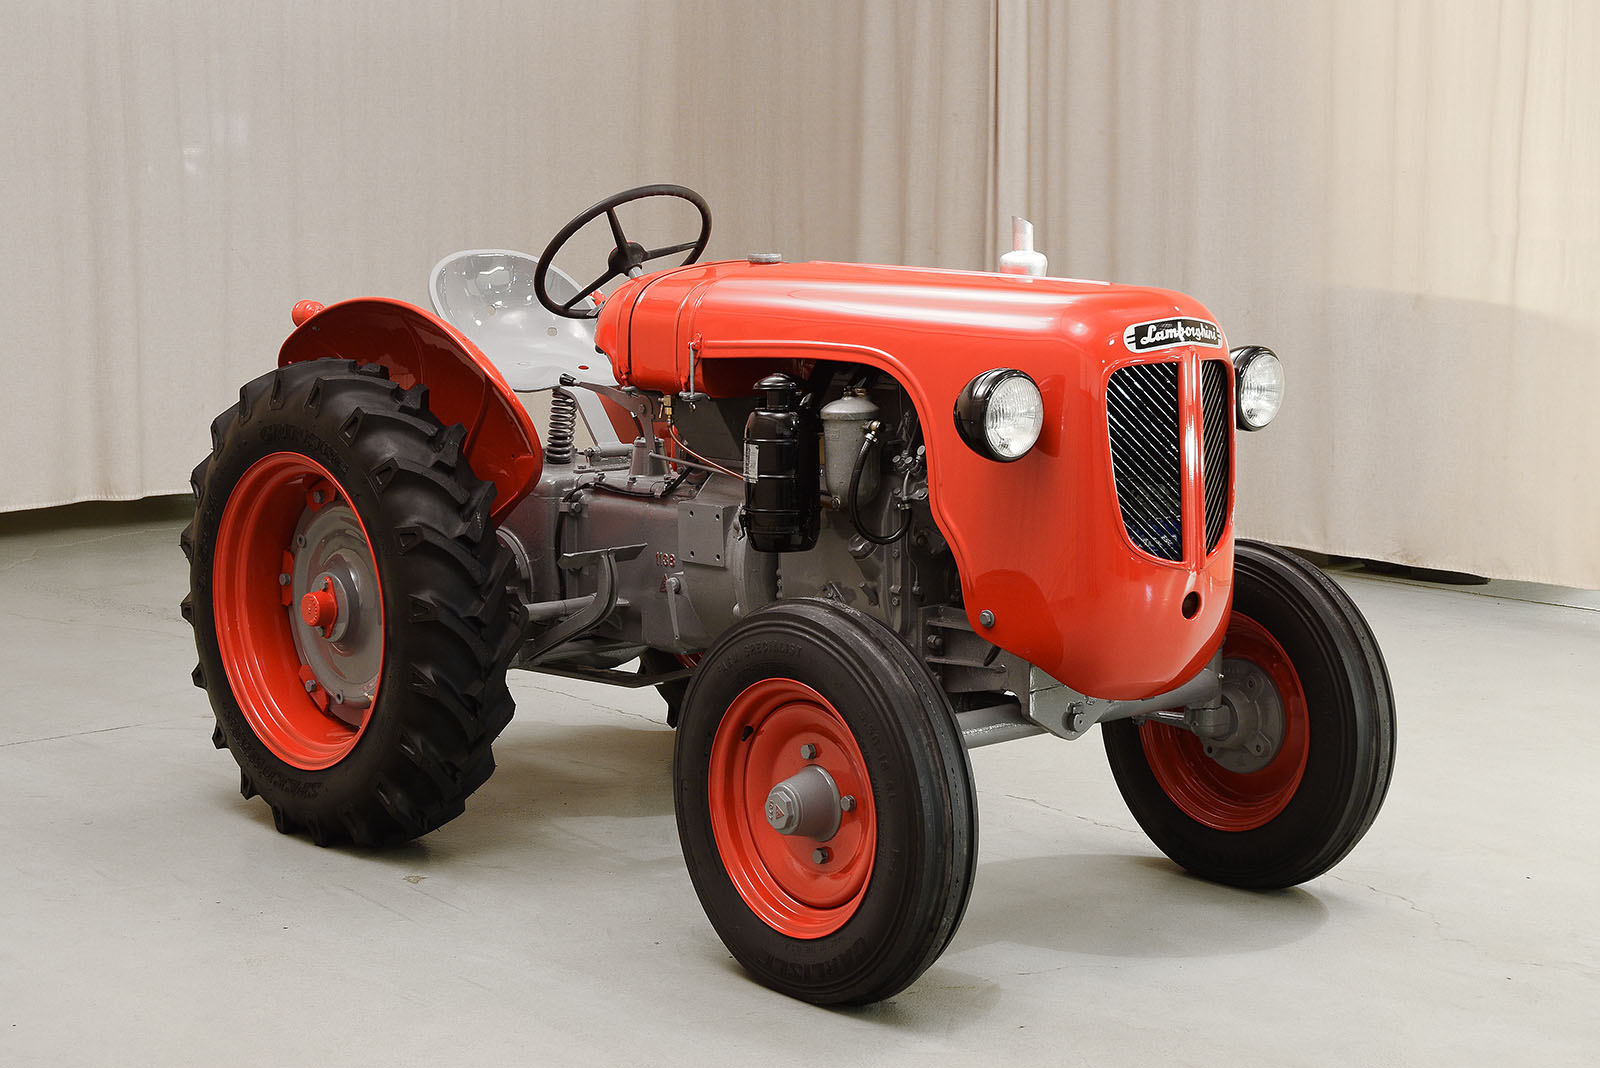 1955 Lamborghini DL 25 Tractor | Hyman Ltd